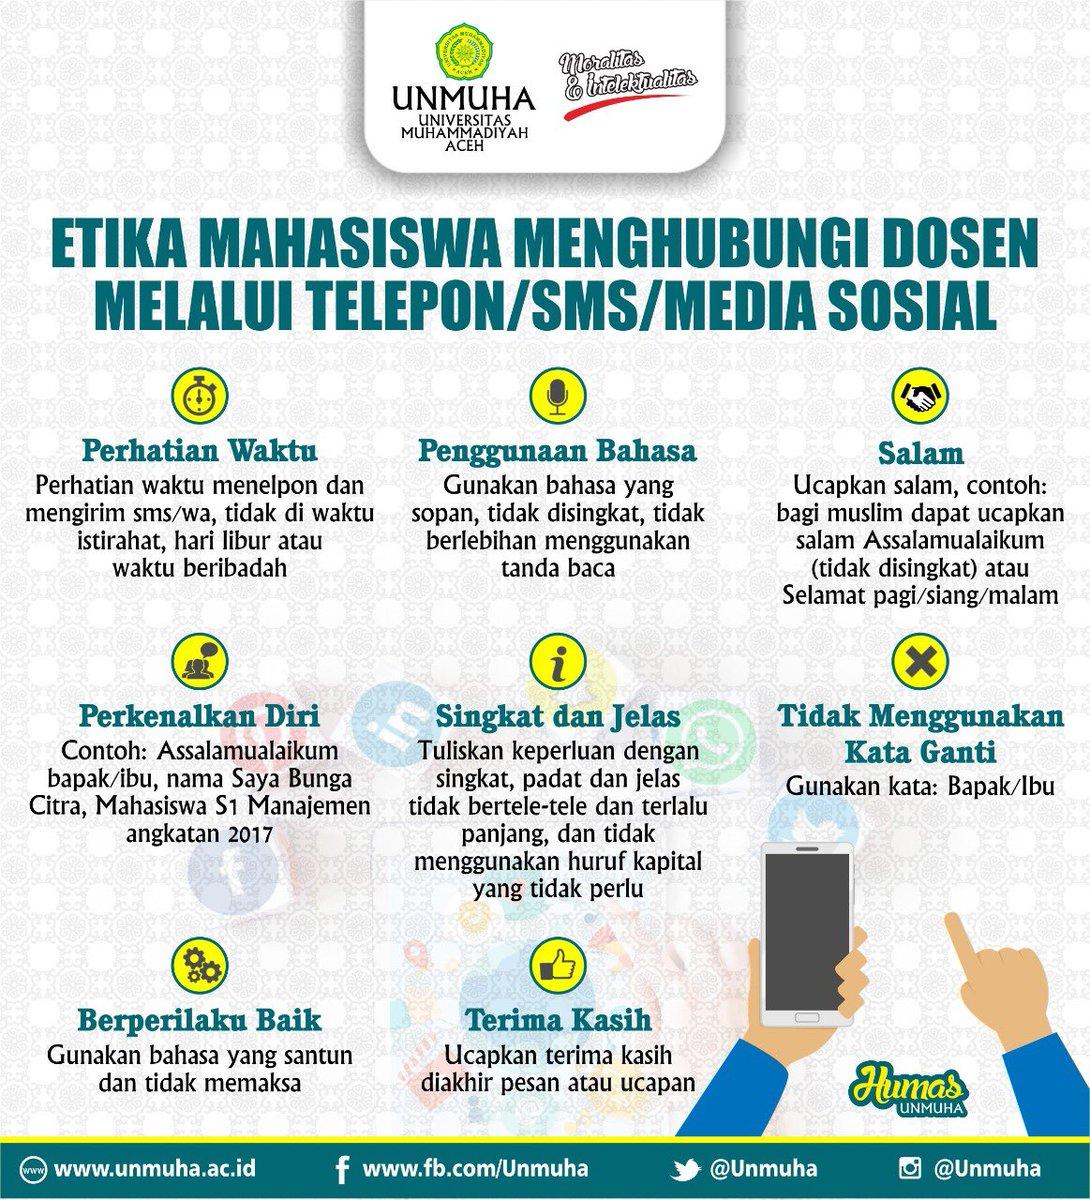 Unmuha Tag On Twitter Twipu